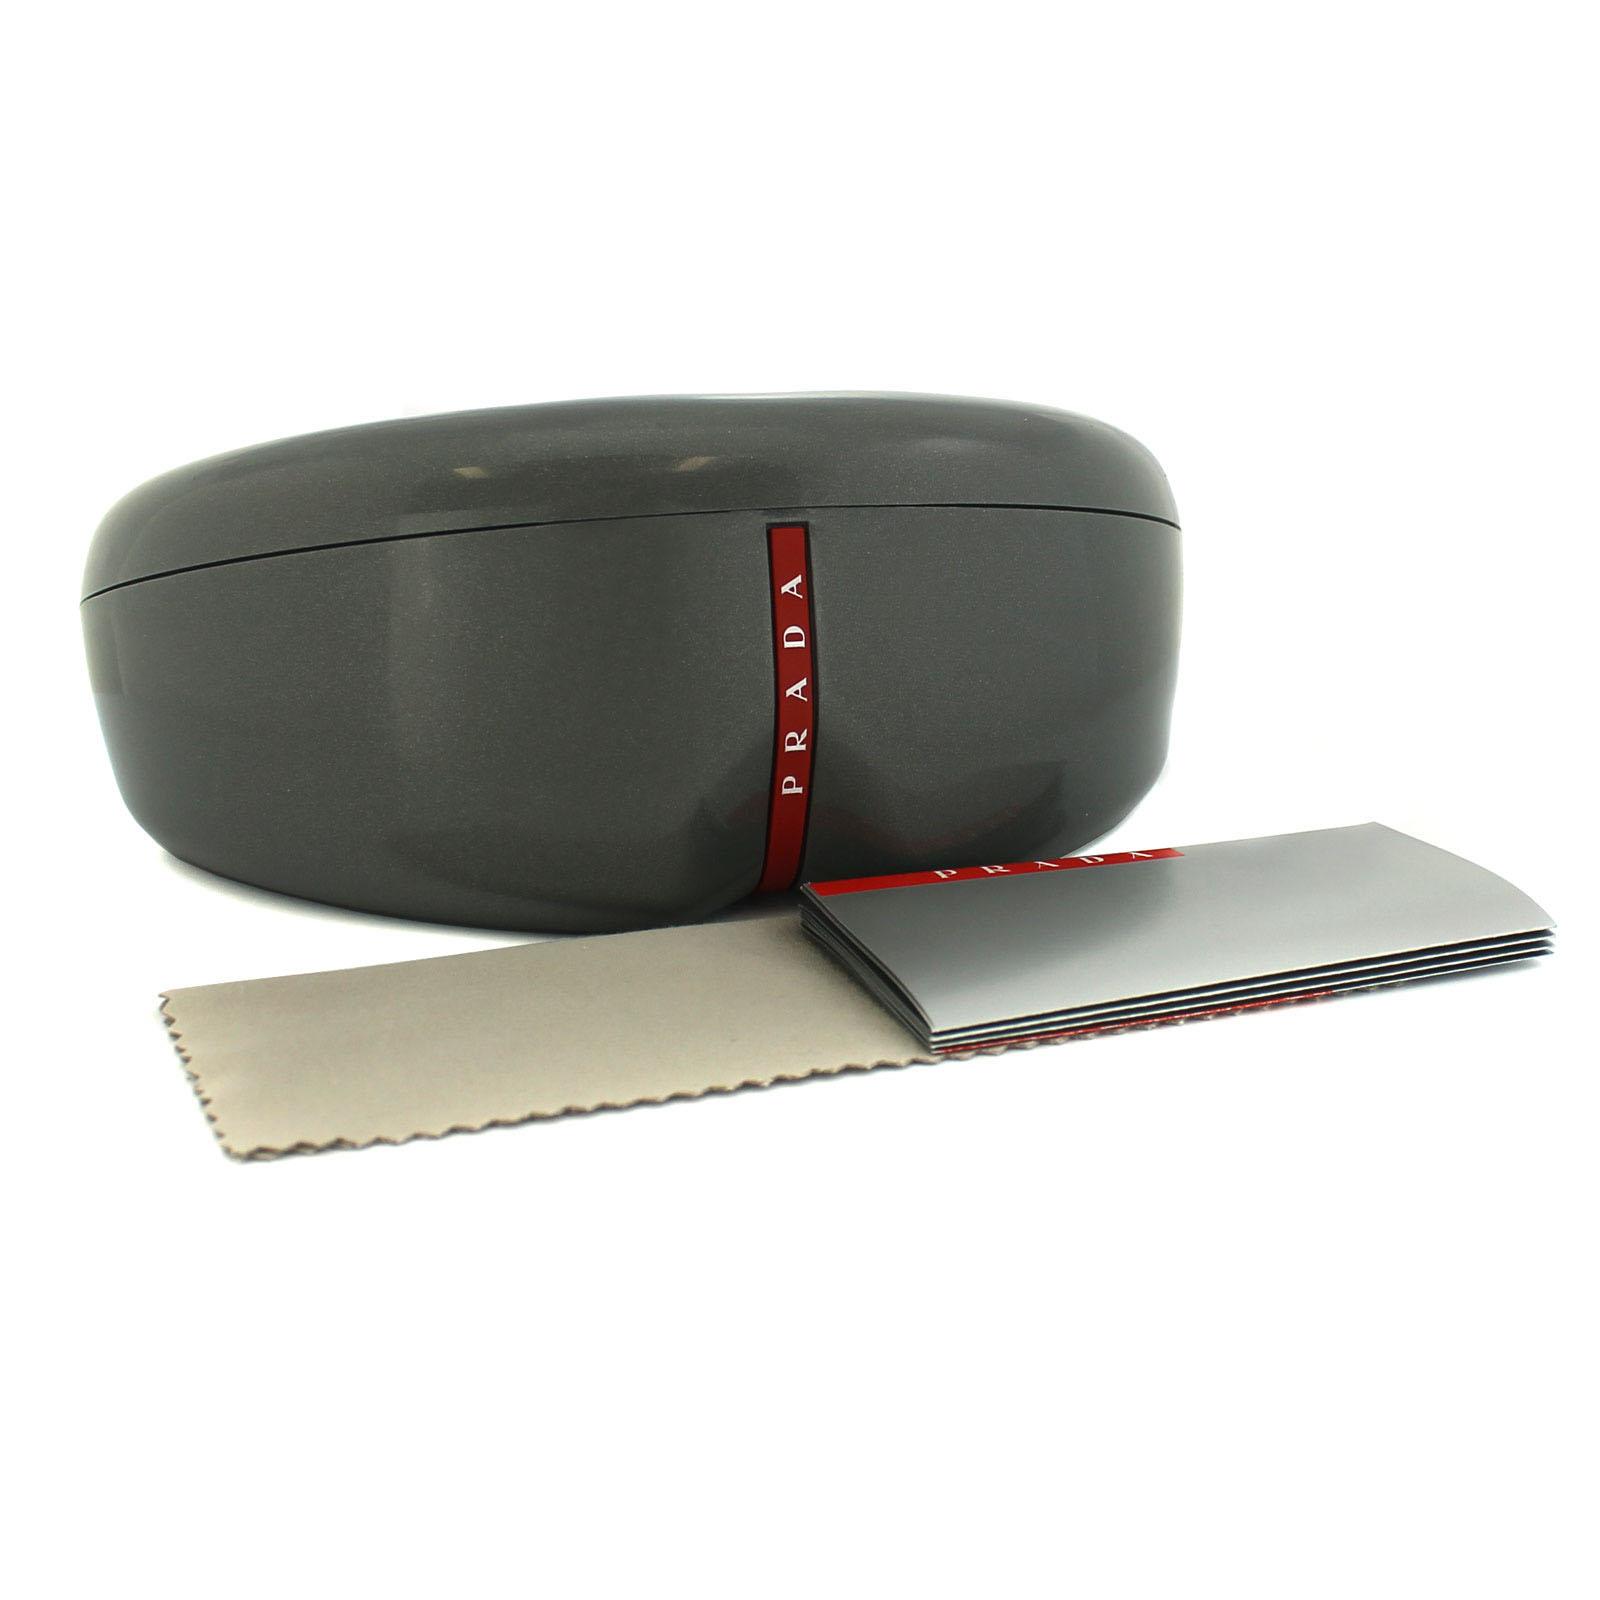 29f87d2880 CENTINELA Gafas de Sol Prada Sport 51QS DG07W1 negro y Gunmetal goma gris  espejo plateado